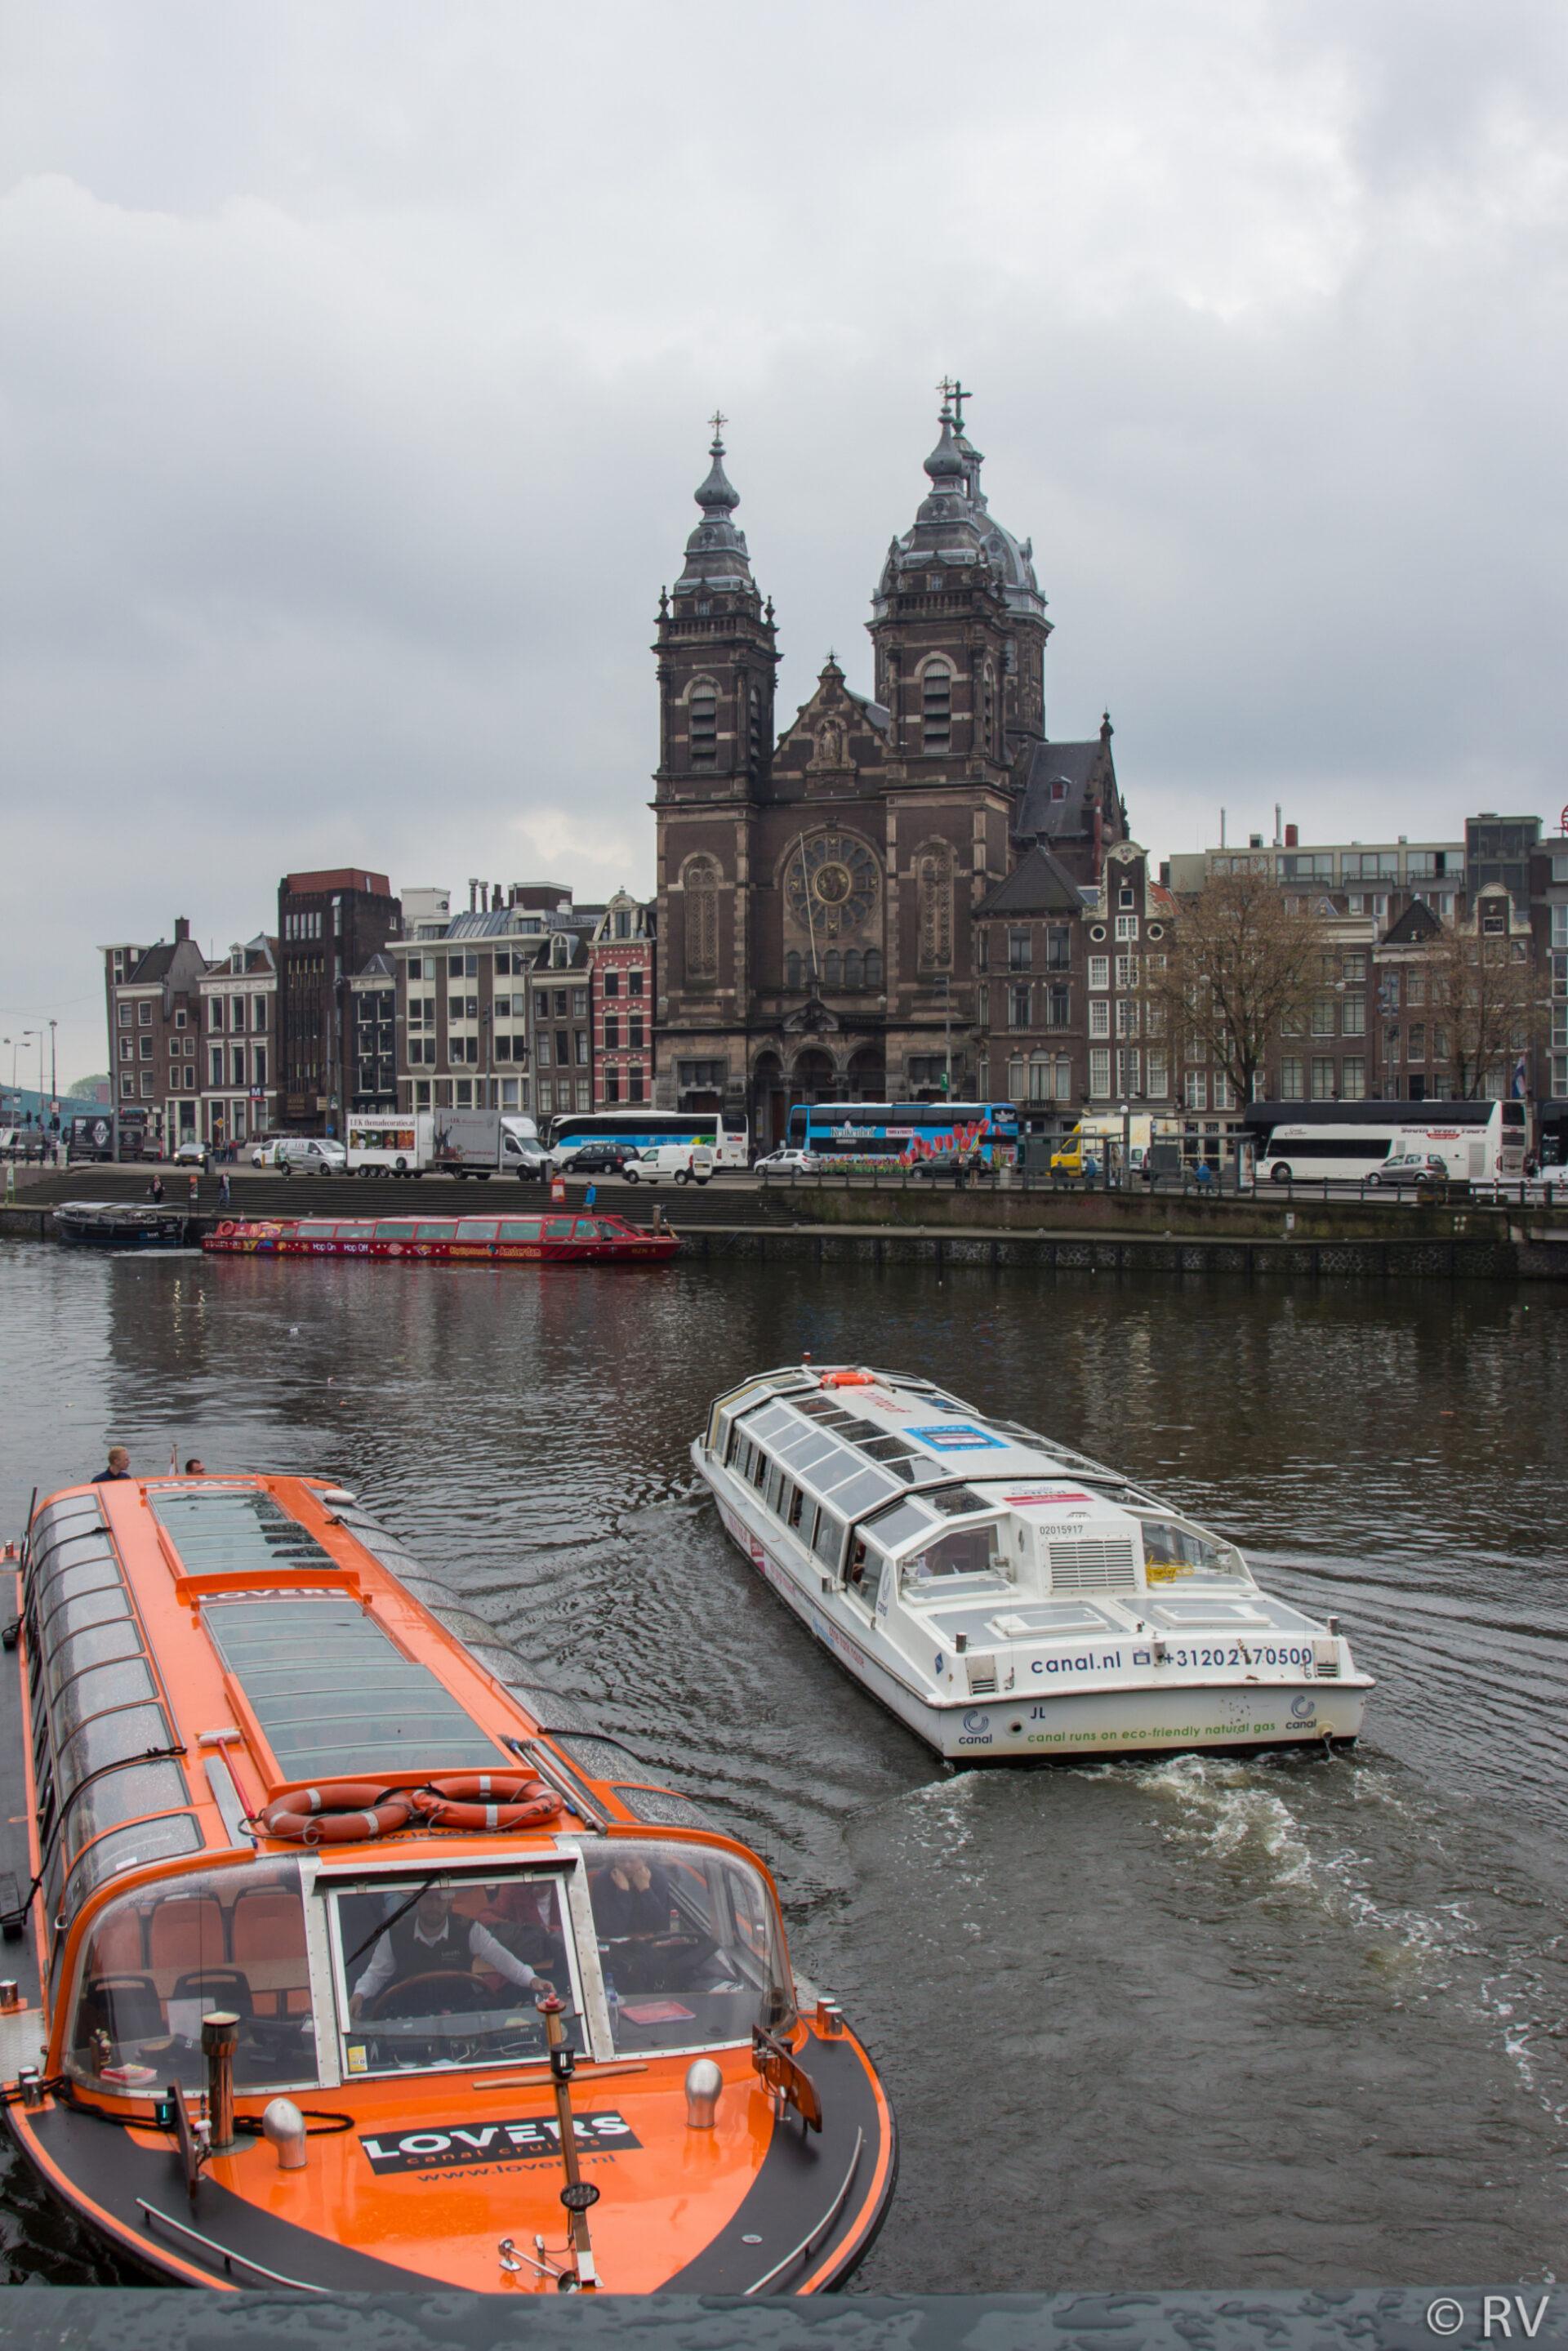 Амстердам + Кёкенхоф (королевский парк цветов вНидерландах)